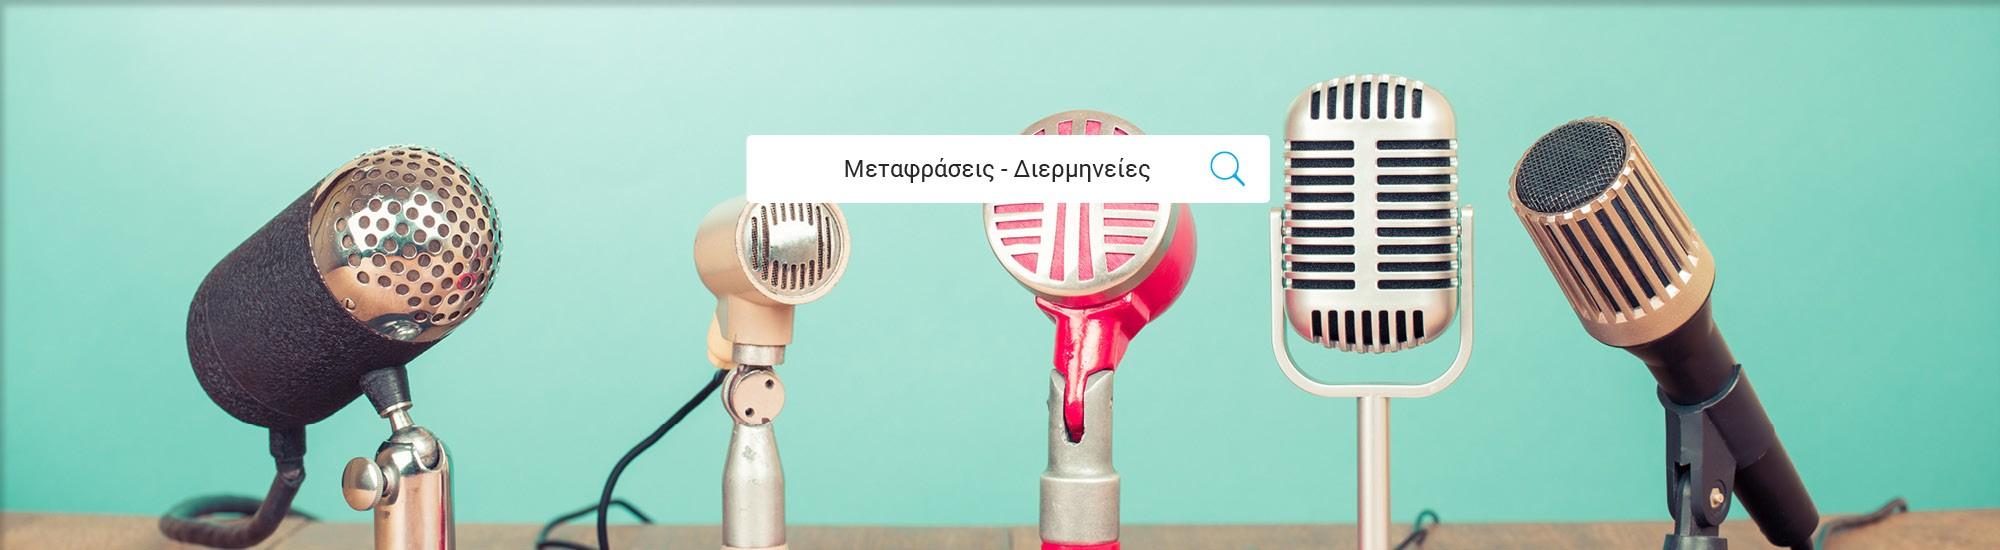 top-banner-metafraseis